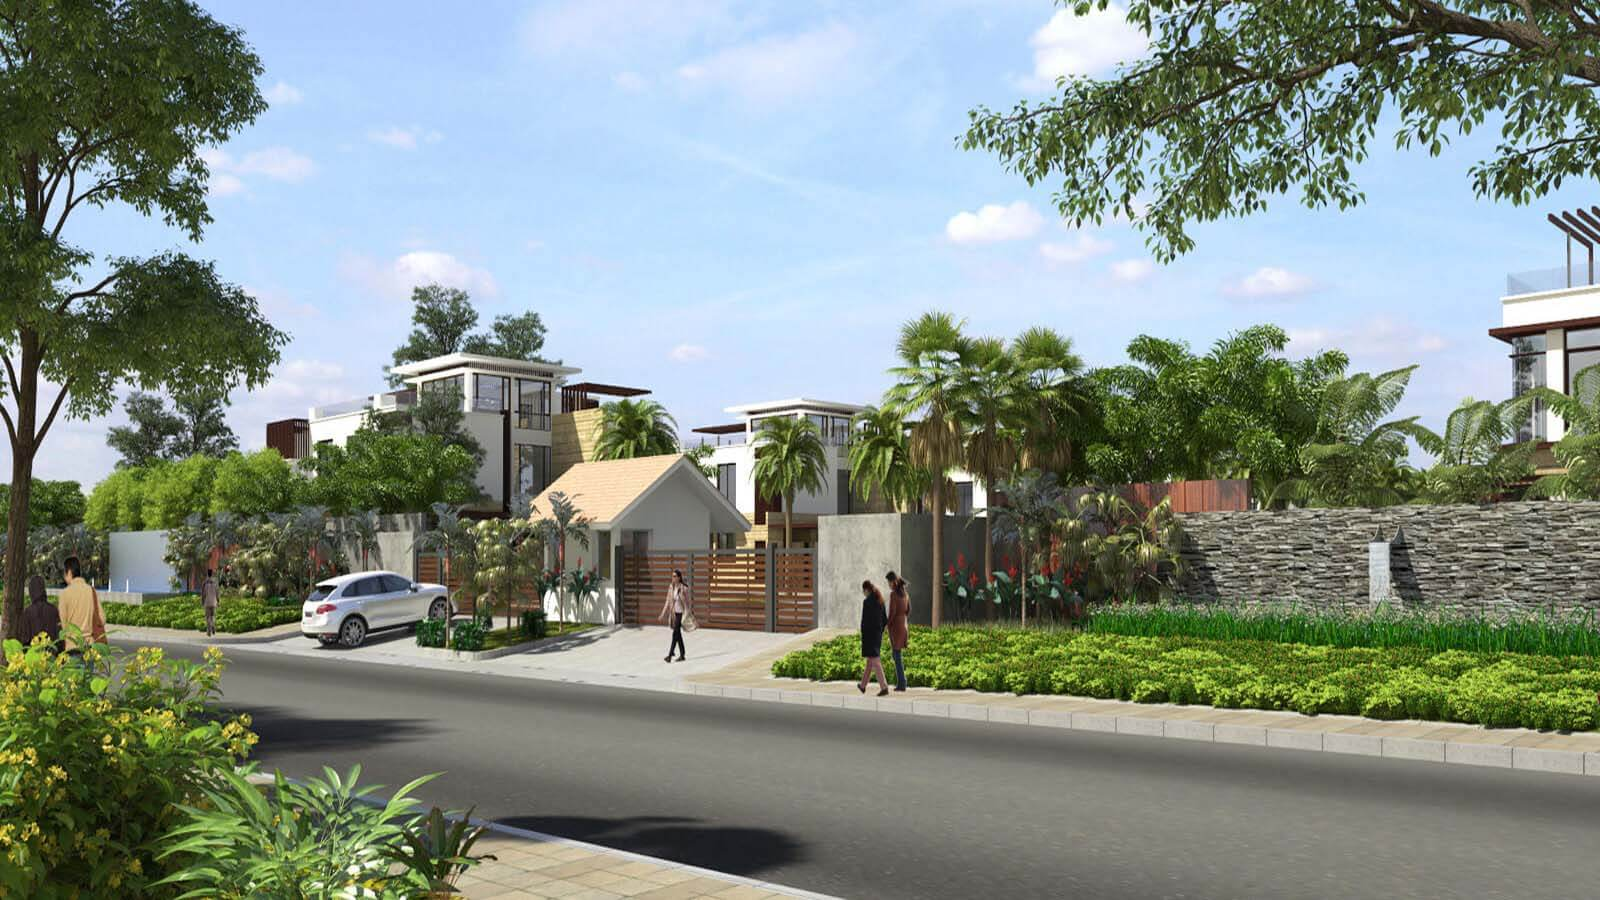 Hosur real estate investment varova investments that shoot